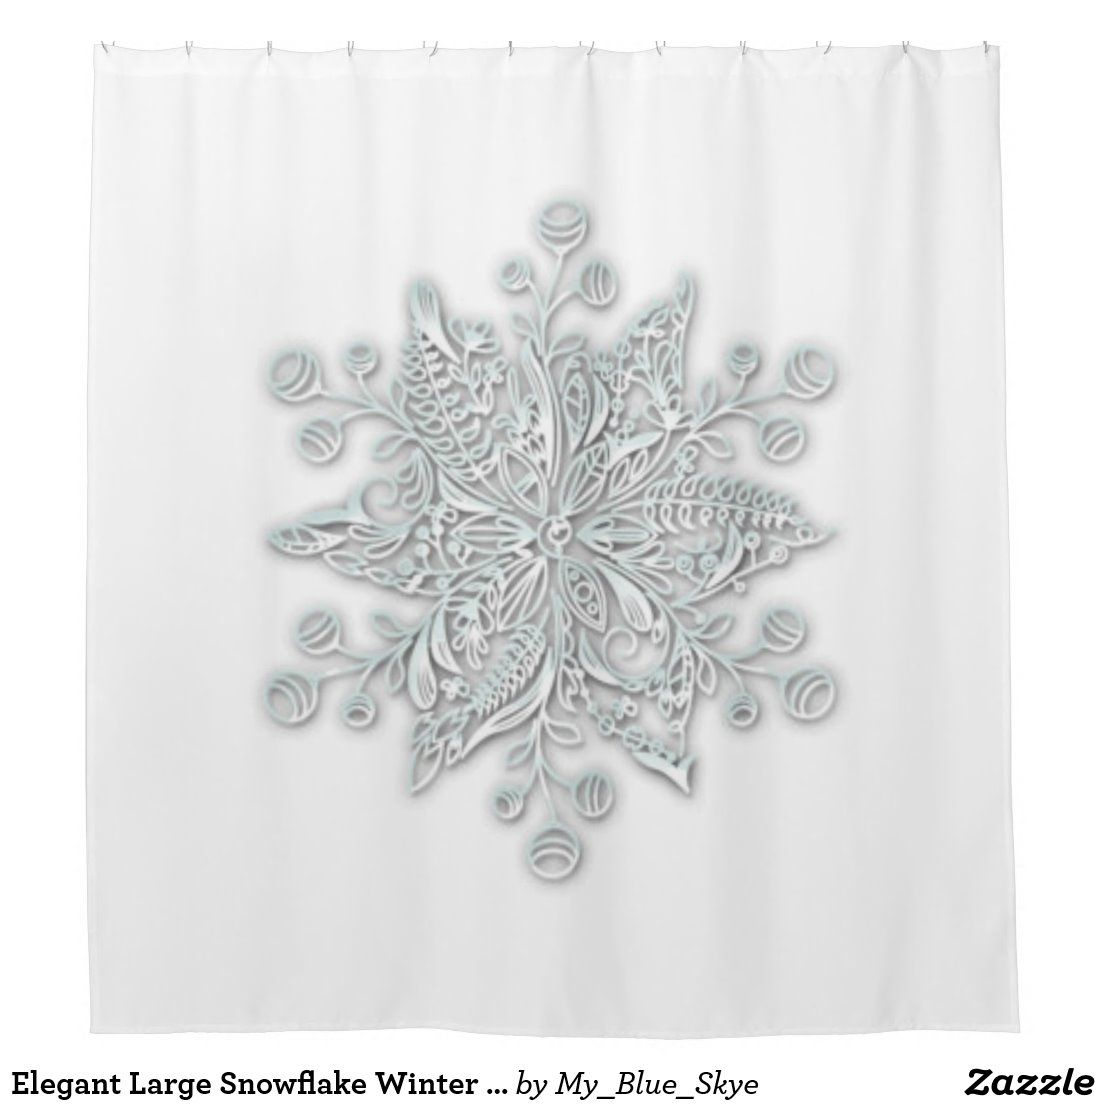 Elegant Large Snowflake Winter Shower Curtain Zazzle Com